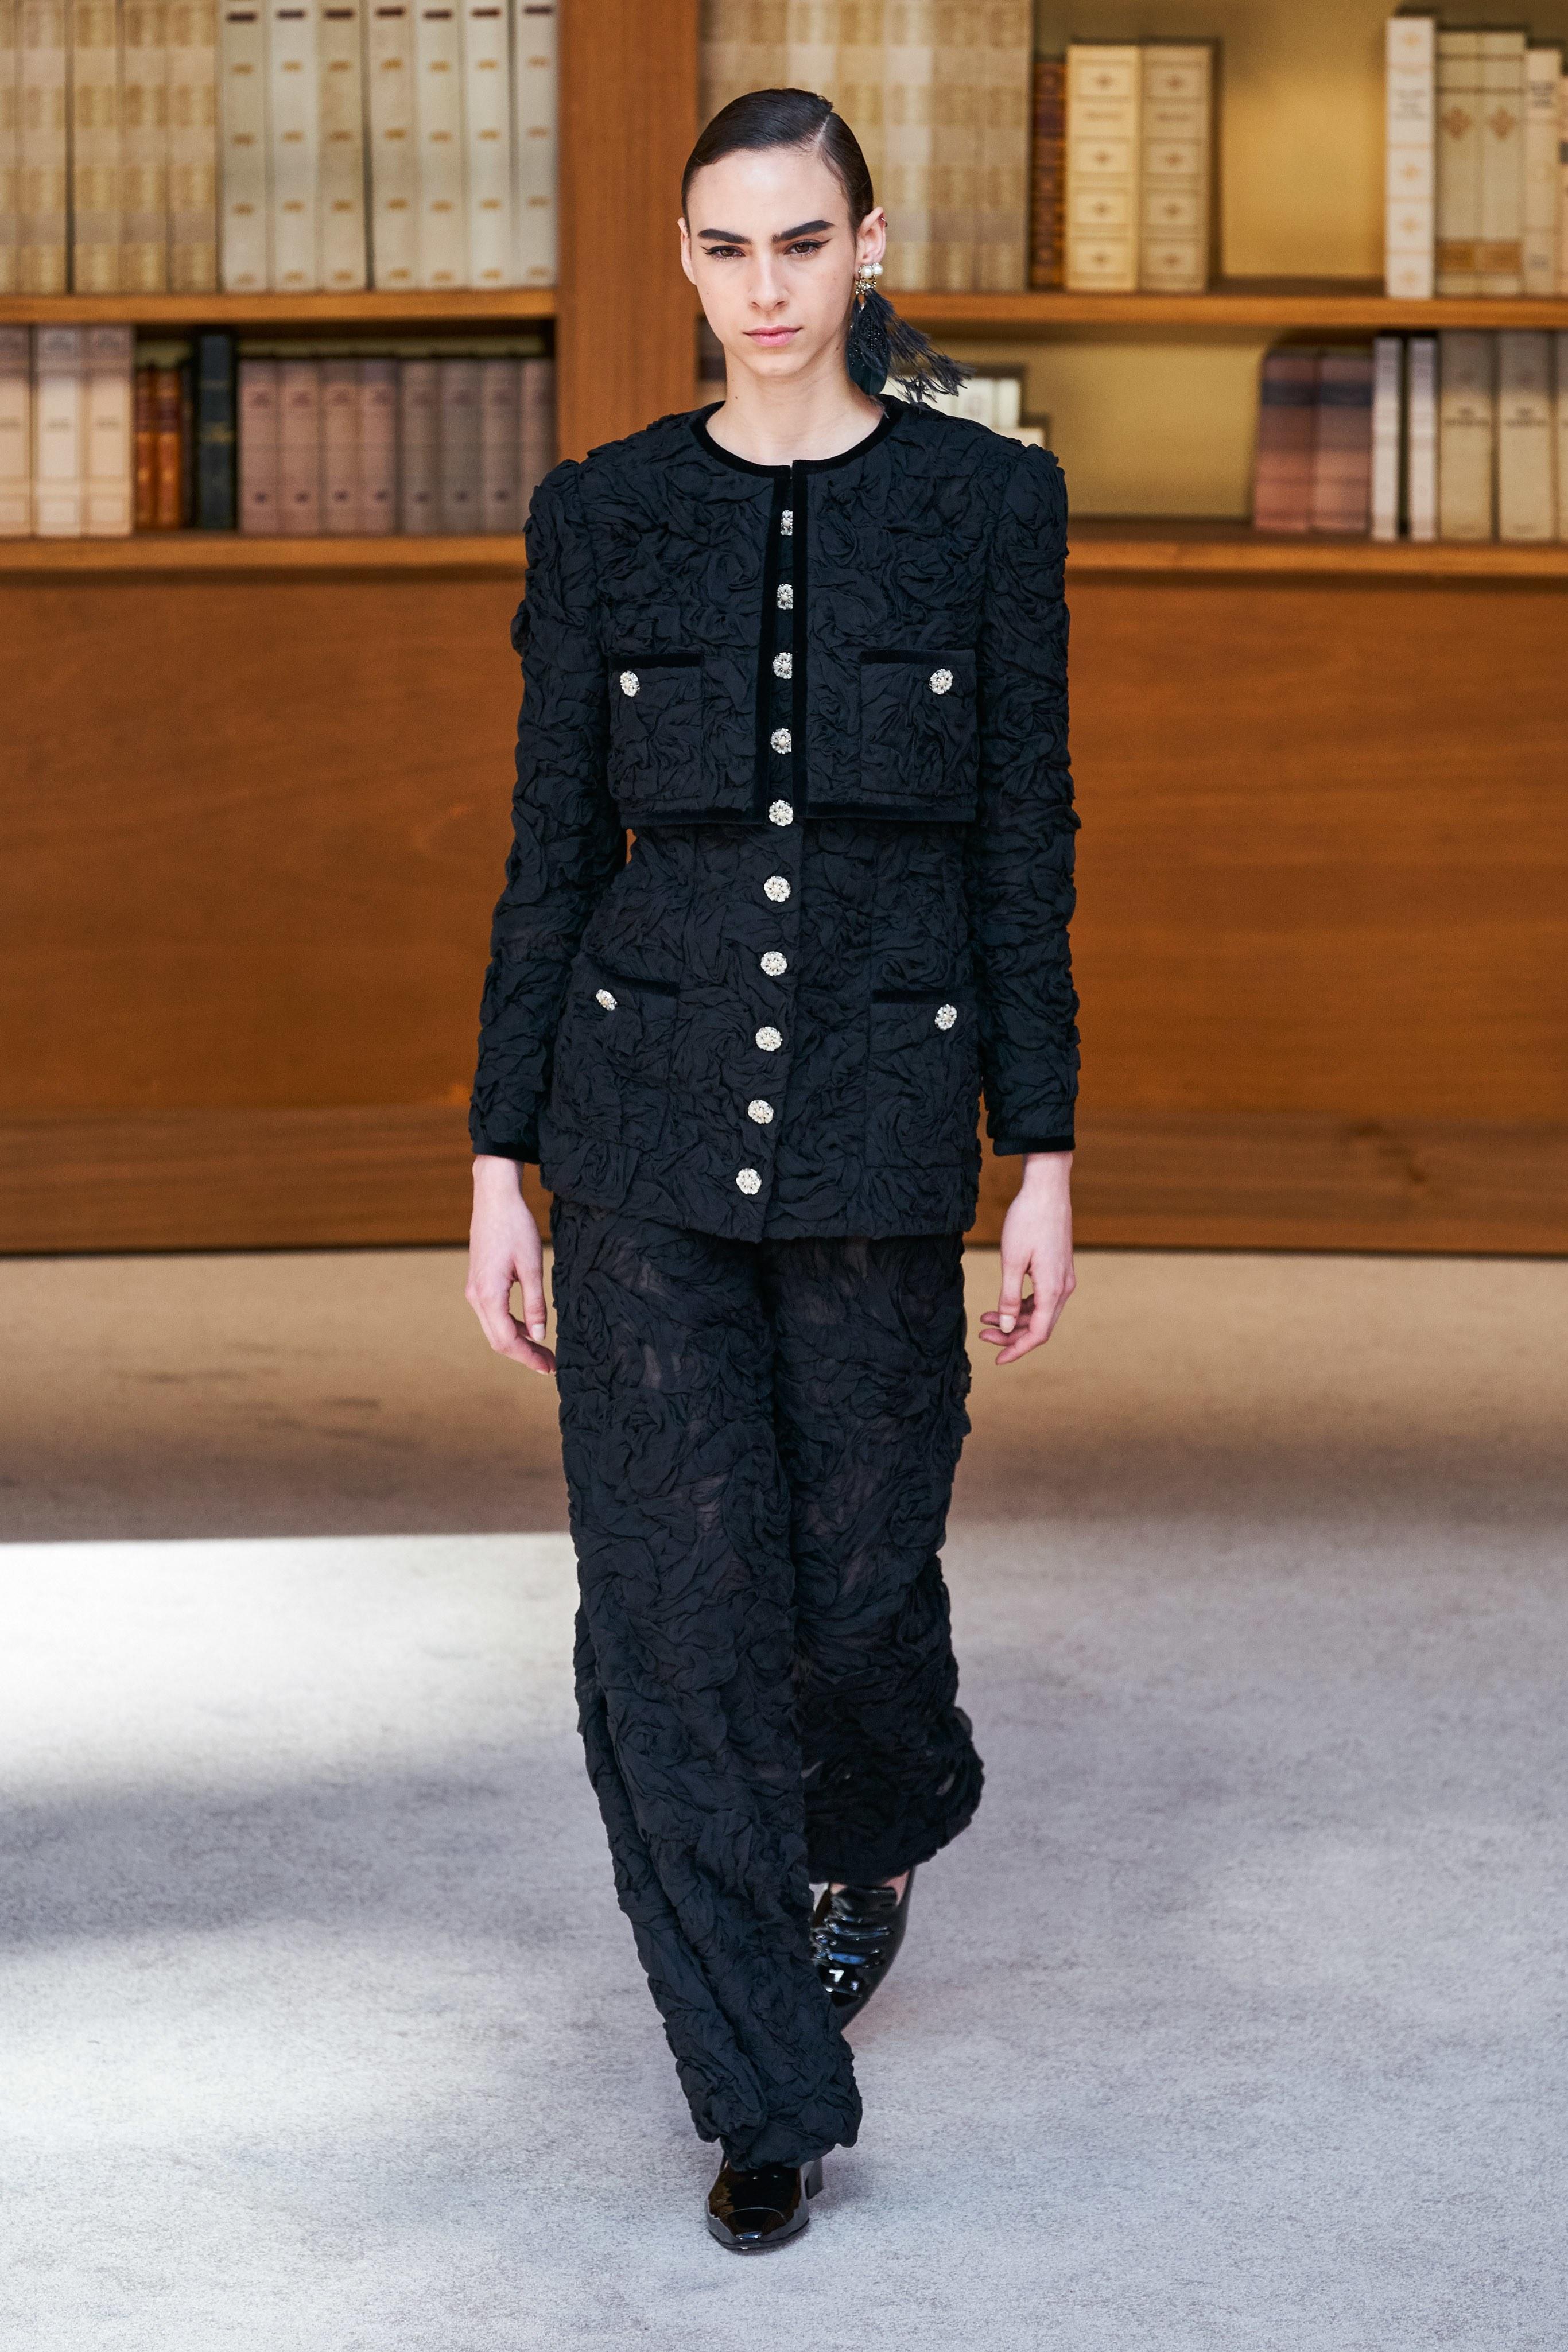 chanel haute couture 2019 virginie viard runway show paris